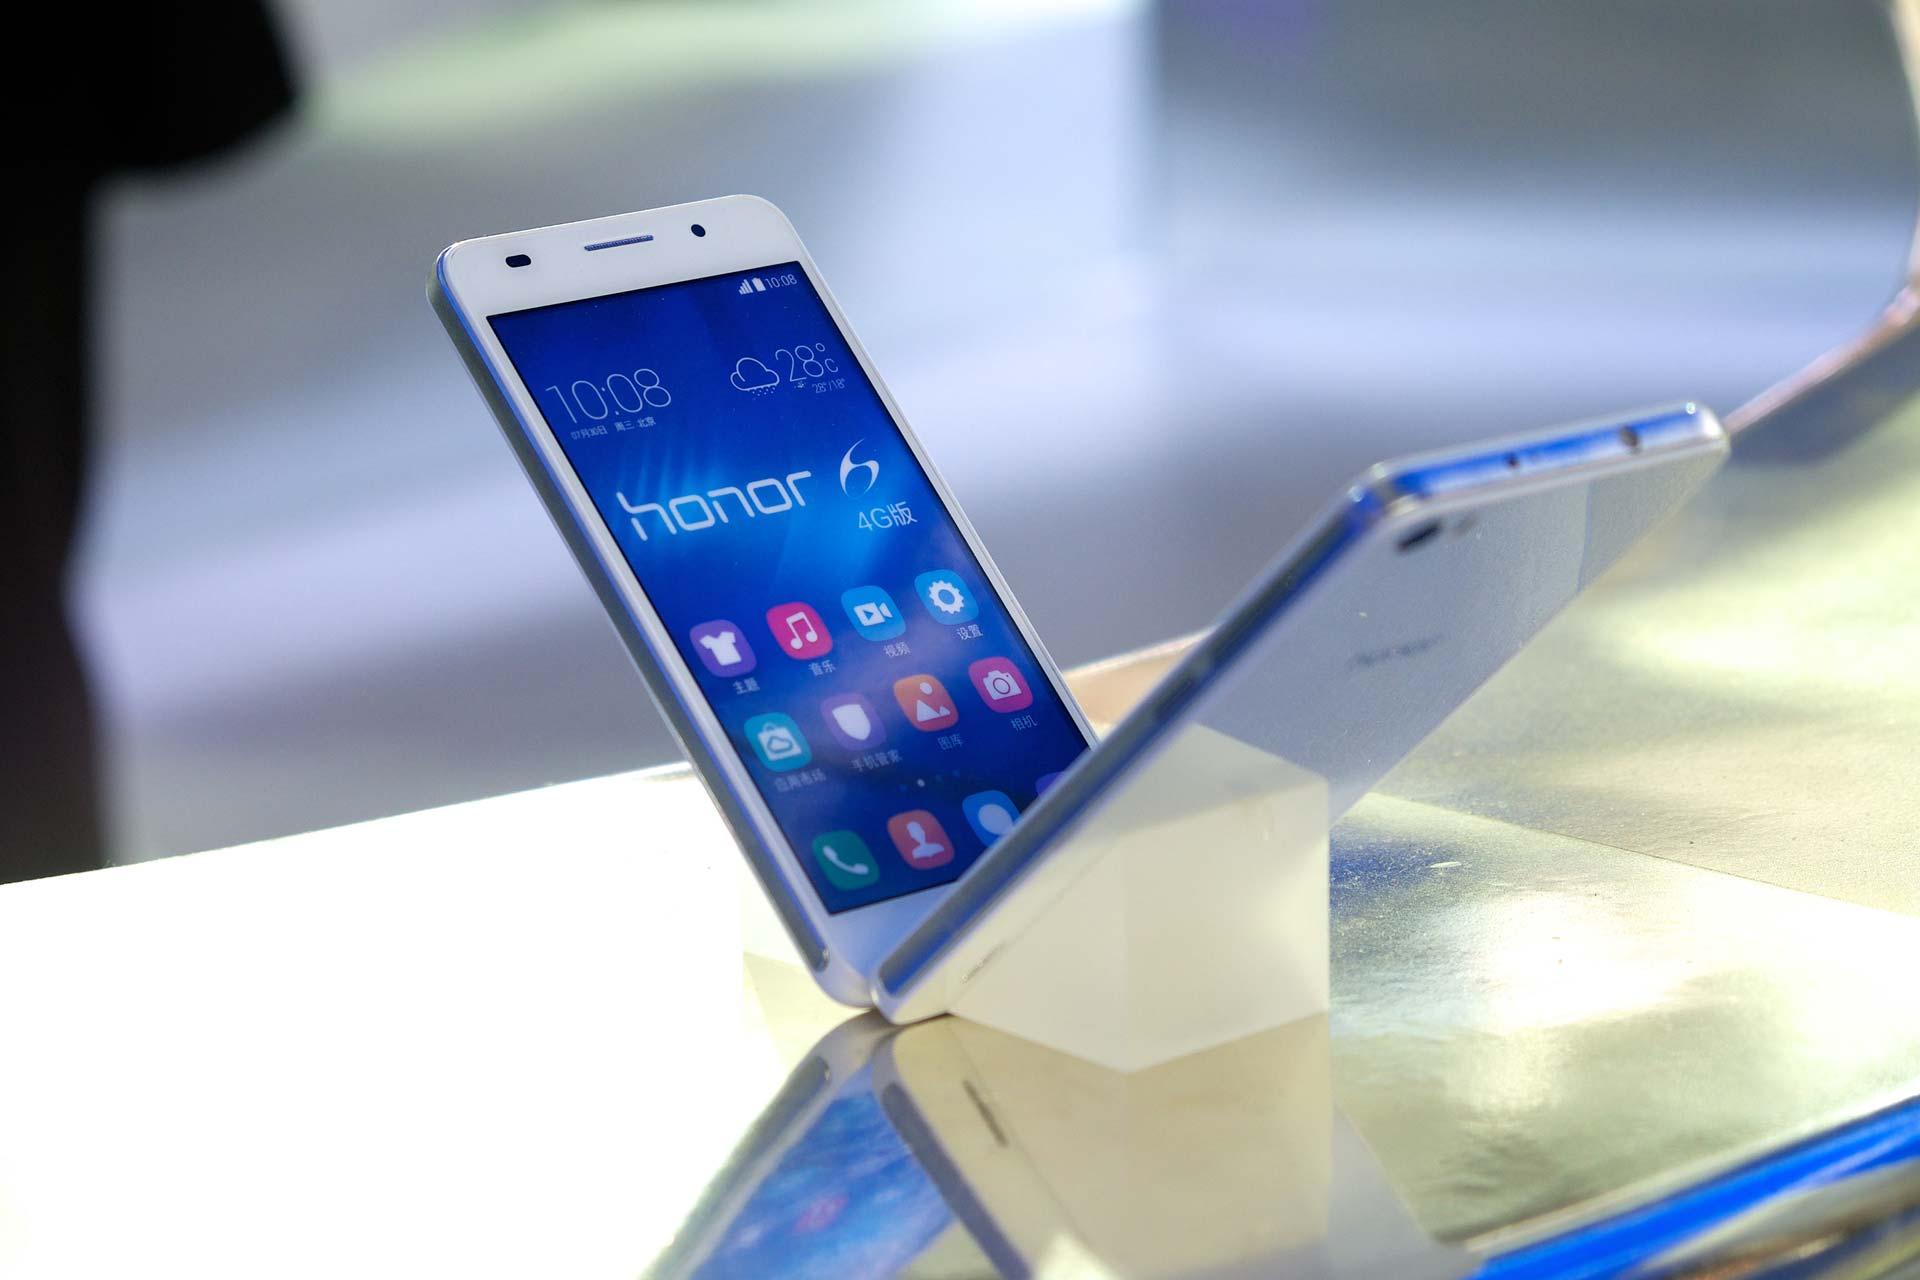 Huawei Honor U8860 VS Huawei IDEOS X5 U8800